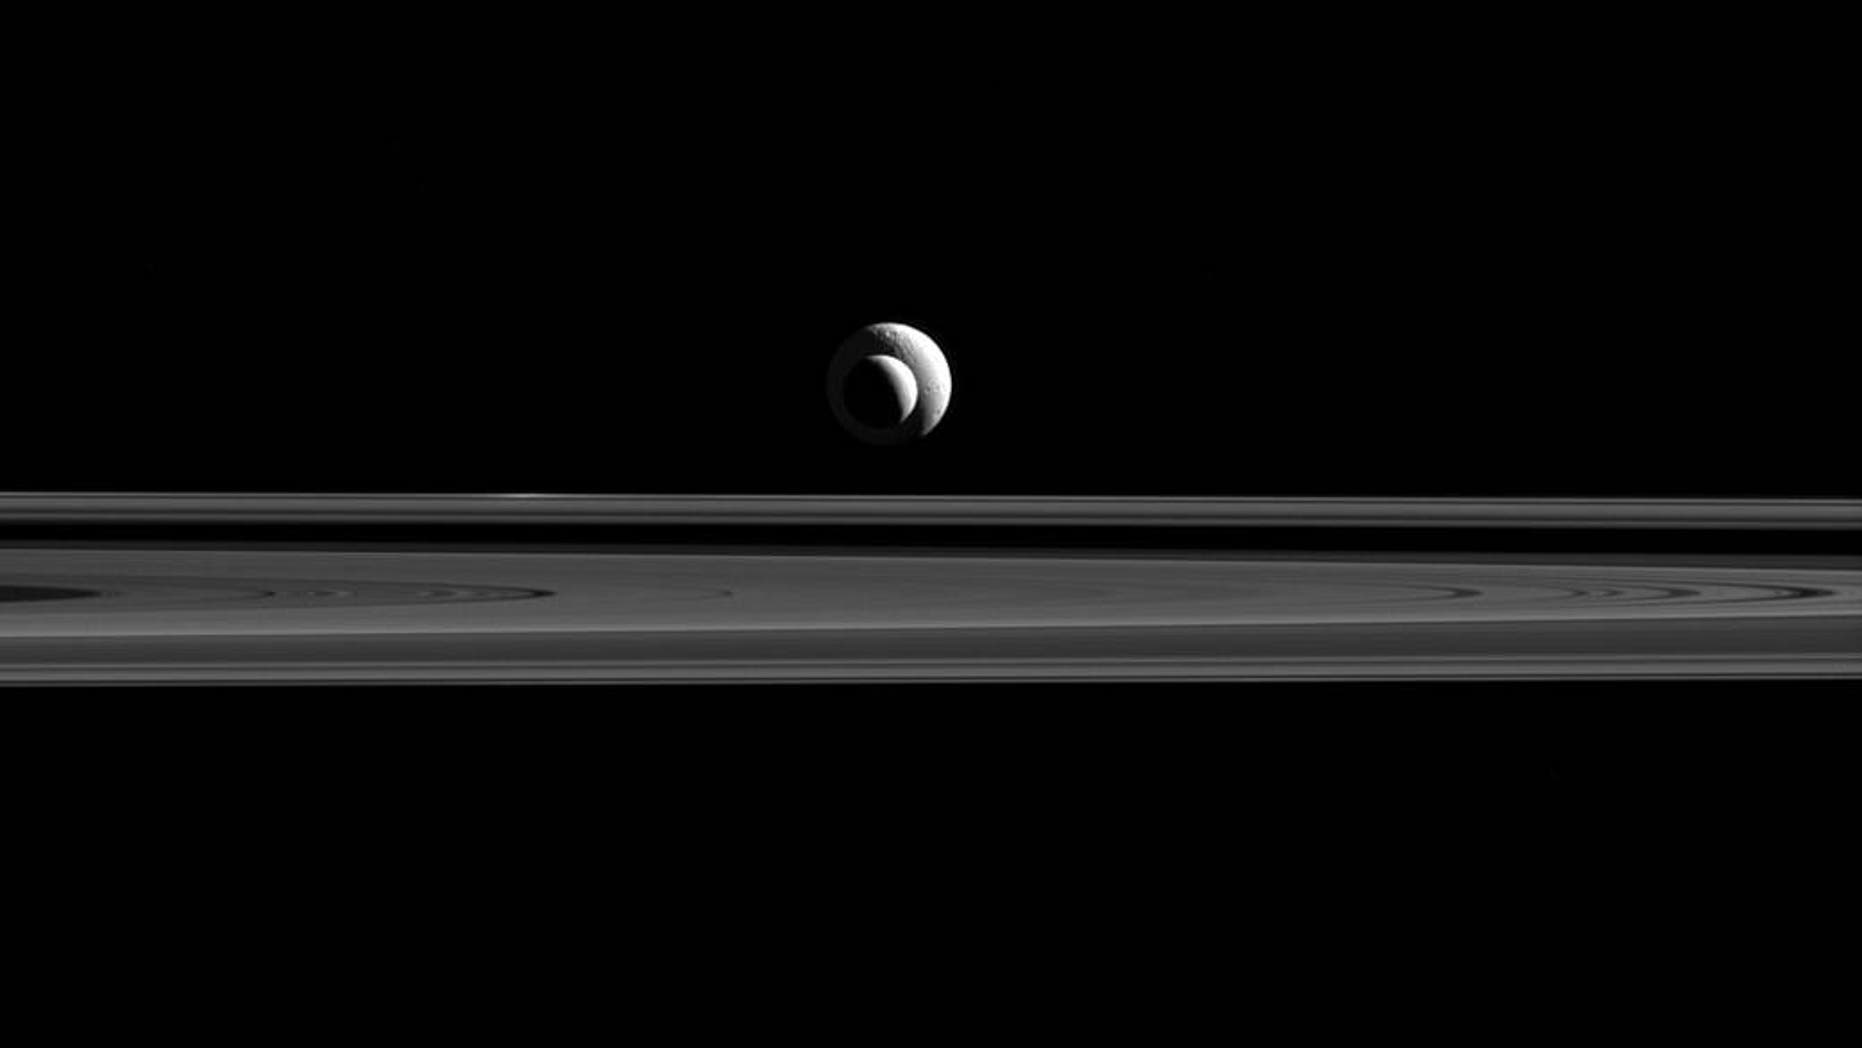 (NASA/JPL-Caltech/Space Science Institute)